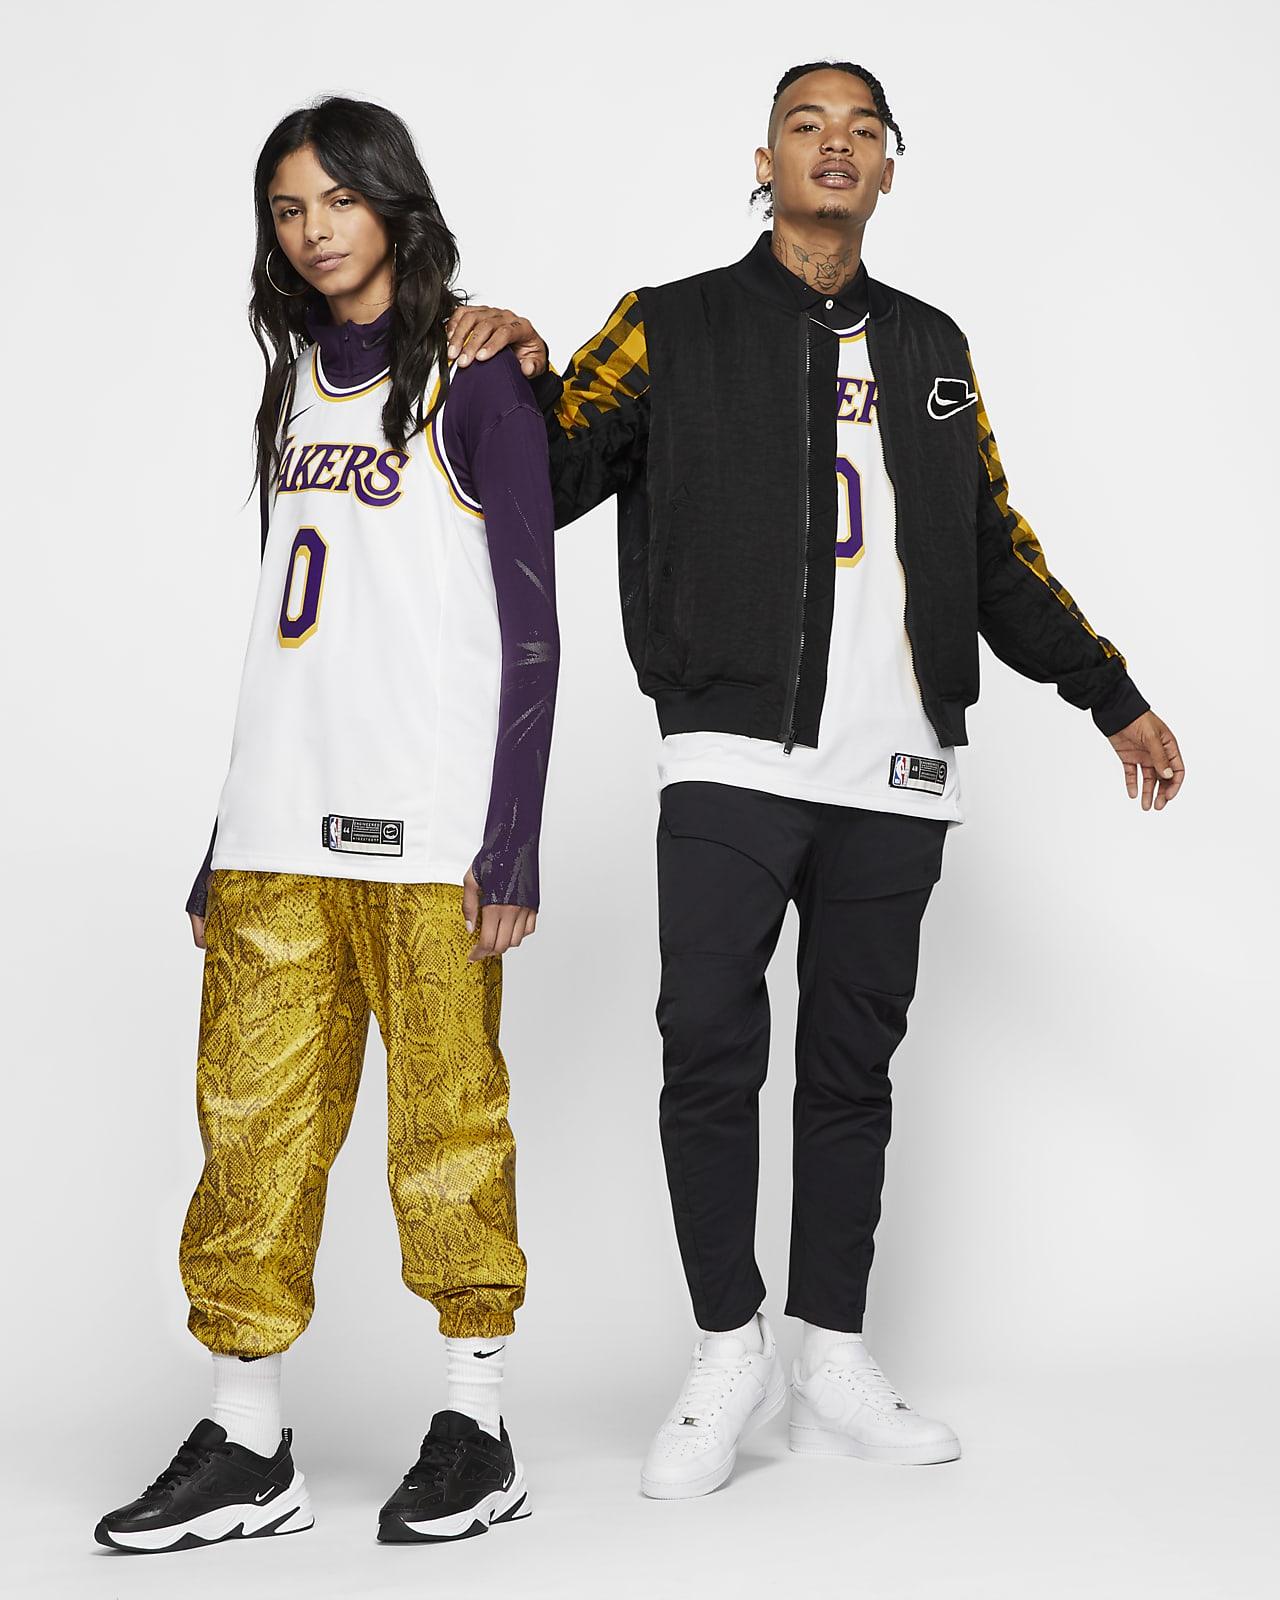 Kyle Kuzma Lakers Association Edition Nike NBA Swingman Jersey